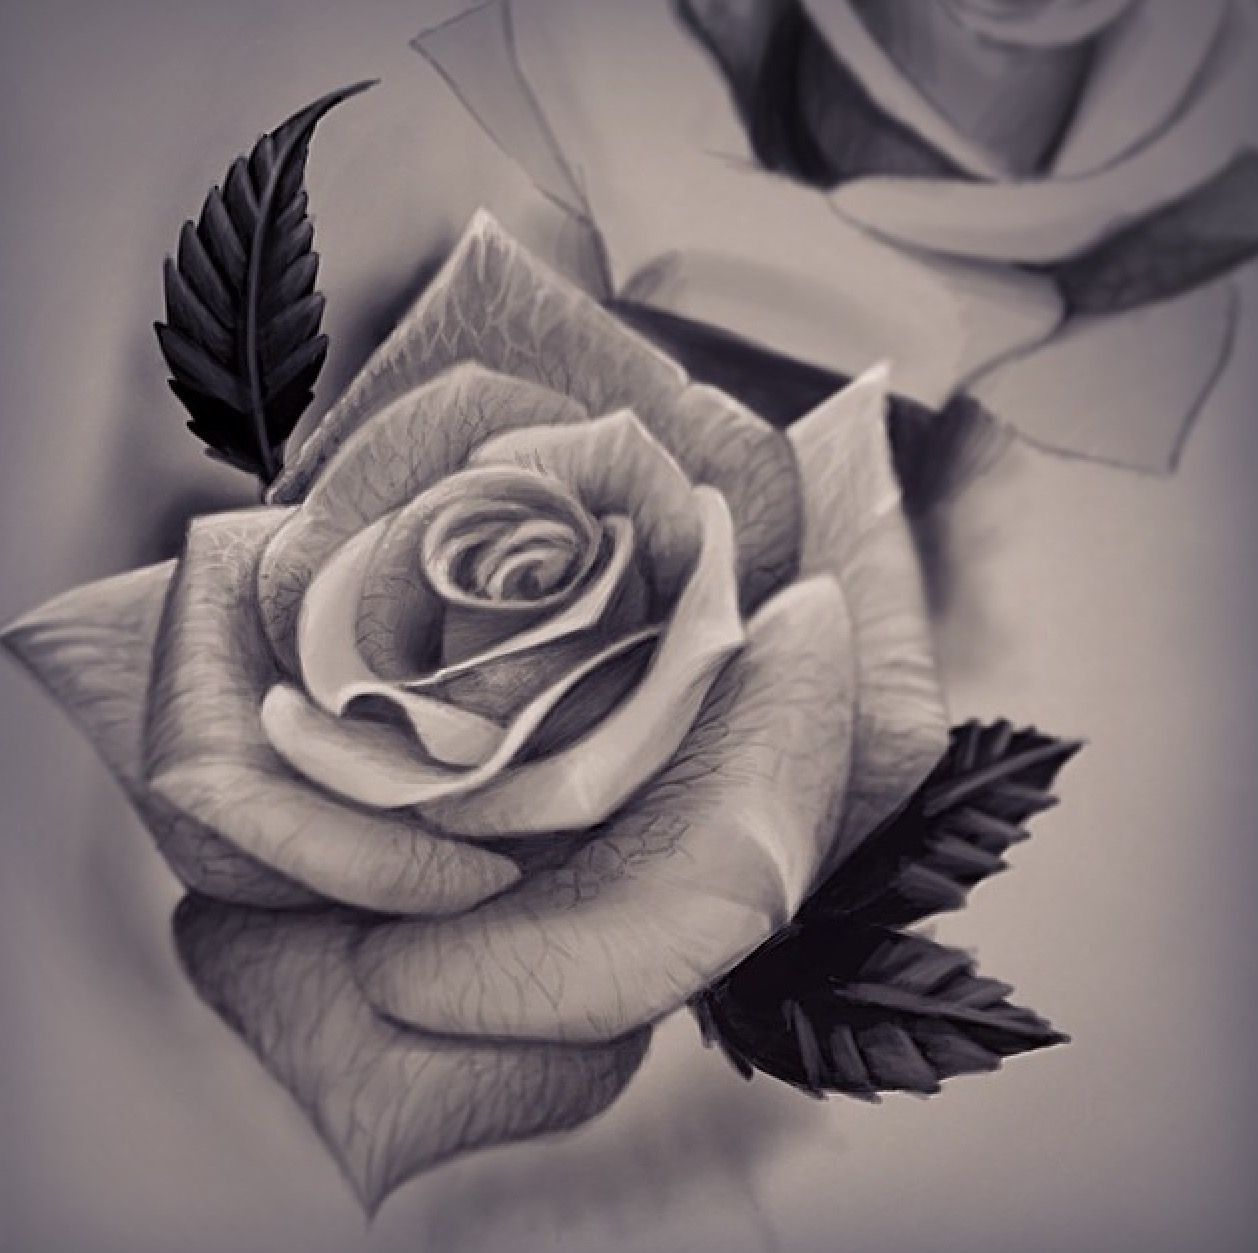 pin de vives virgen santa en flowers pinterest tatuaje de rosa realista tatuajes y rosas. Black Bedroom Furniture Sets. Home Design Ideas